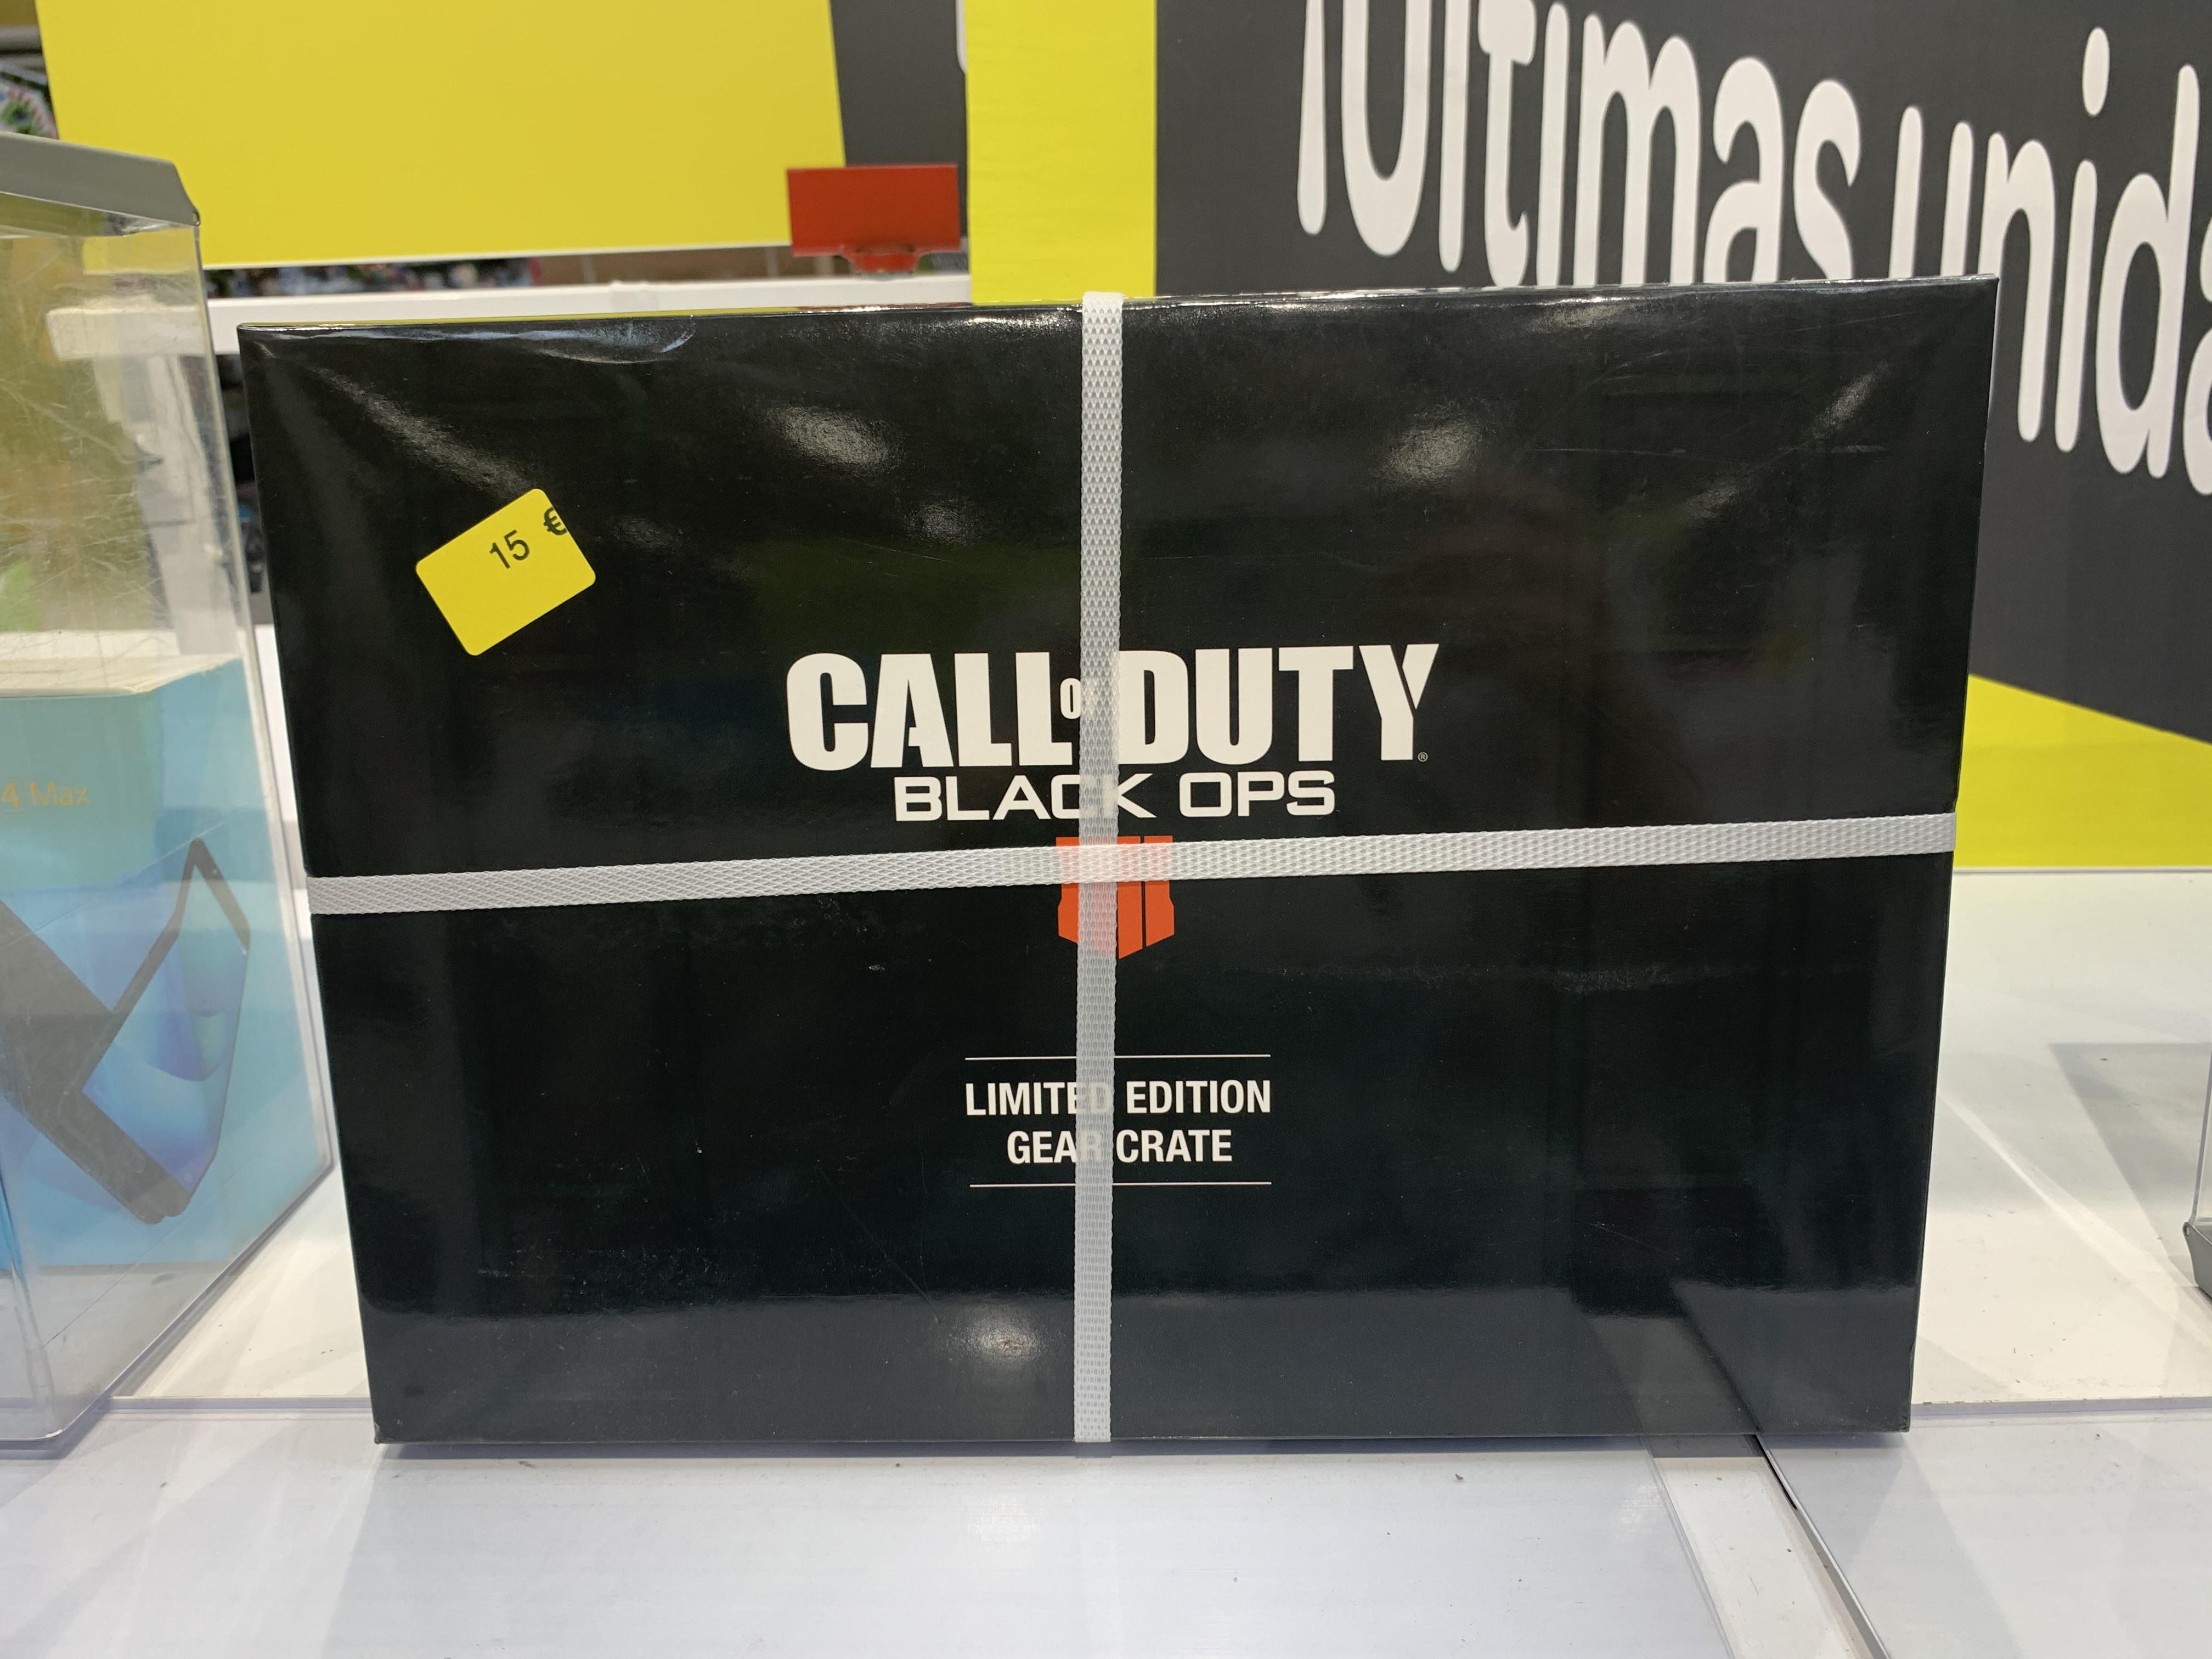 Set coleccionista COD Black Ops 4 Merchandising (Carrefour Lorca)